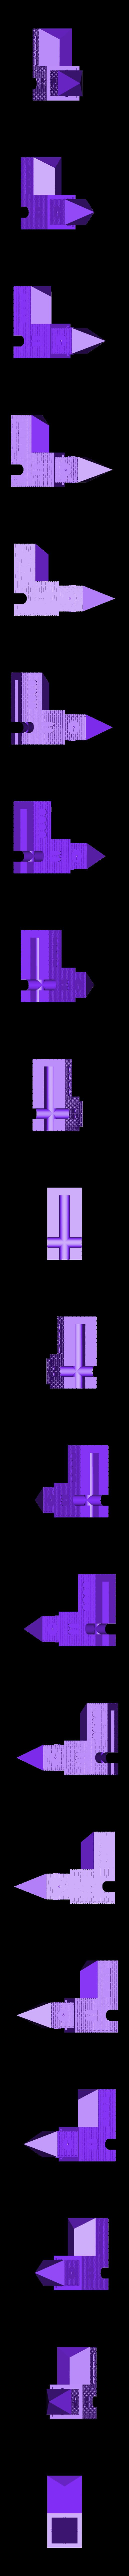 Kerk.stl Download STL file Church • 3D print design, eAgent